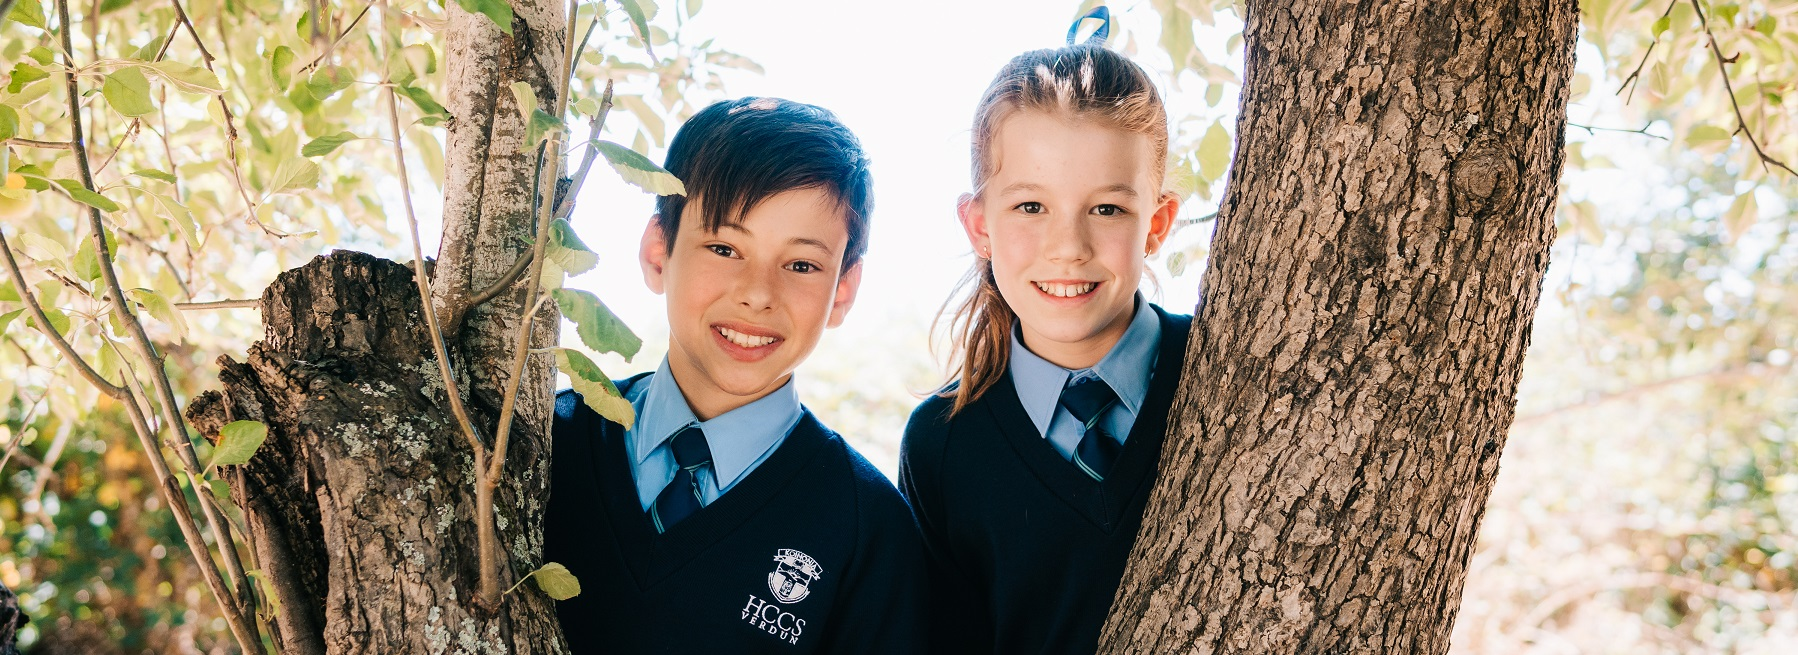 Hills R-12 School Vision Values